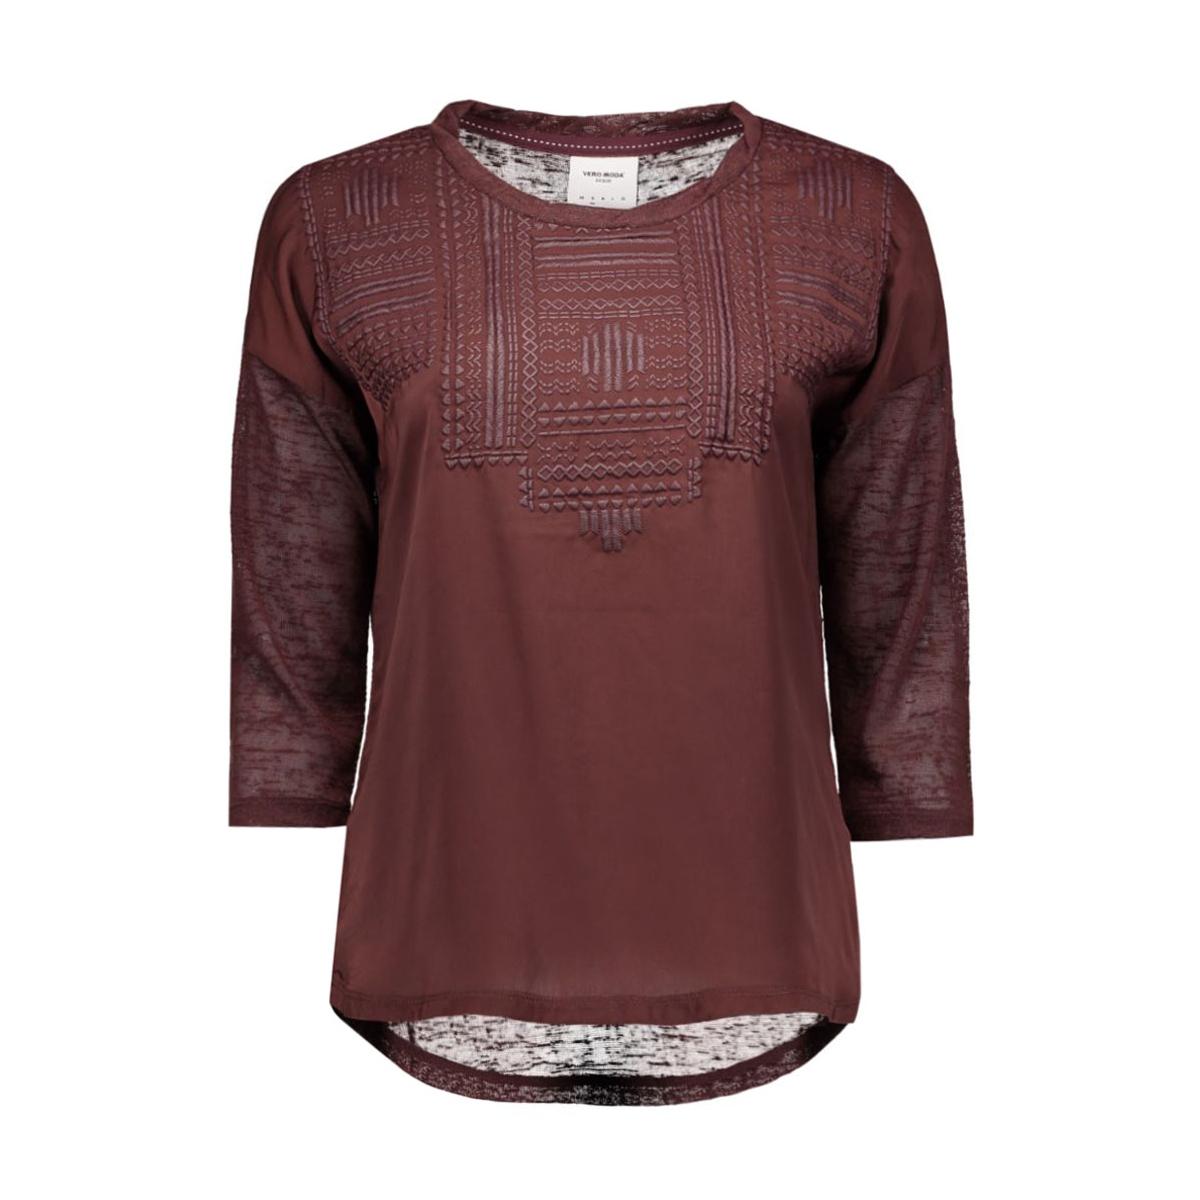 vmsally 3/4 foam print top dnm jrs 10162010 vero moda t-shirt decadent chocolat